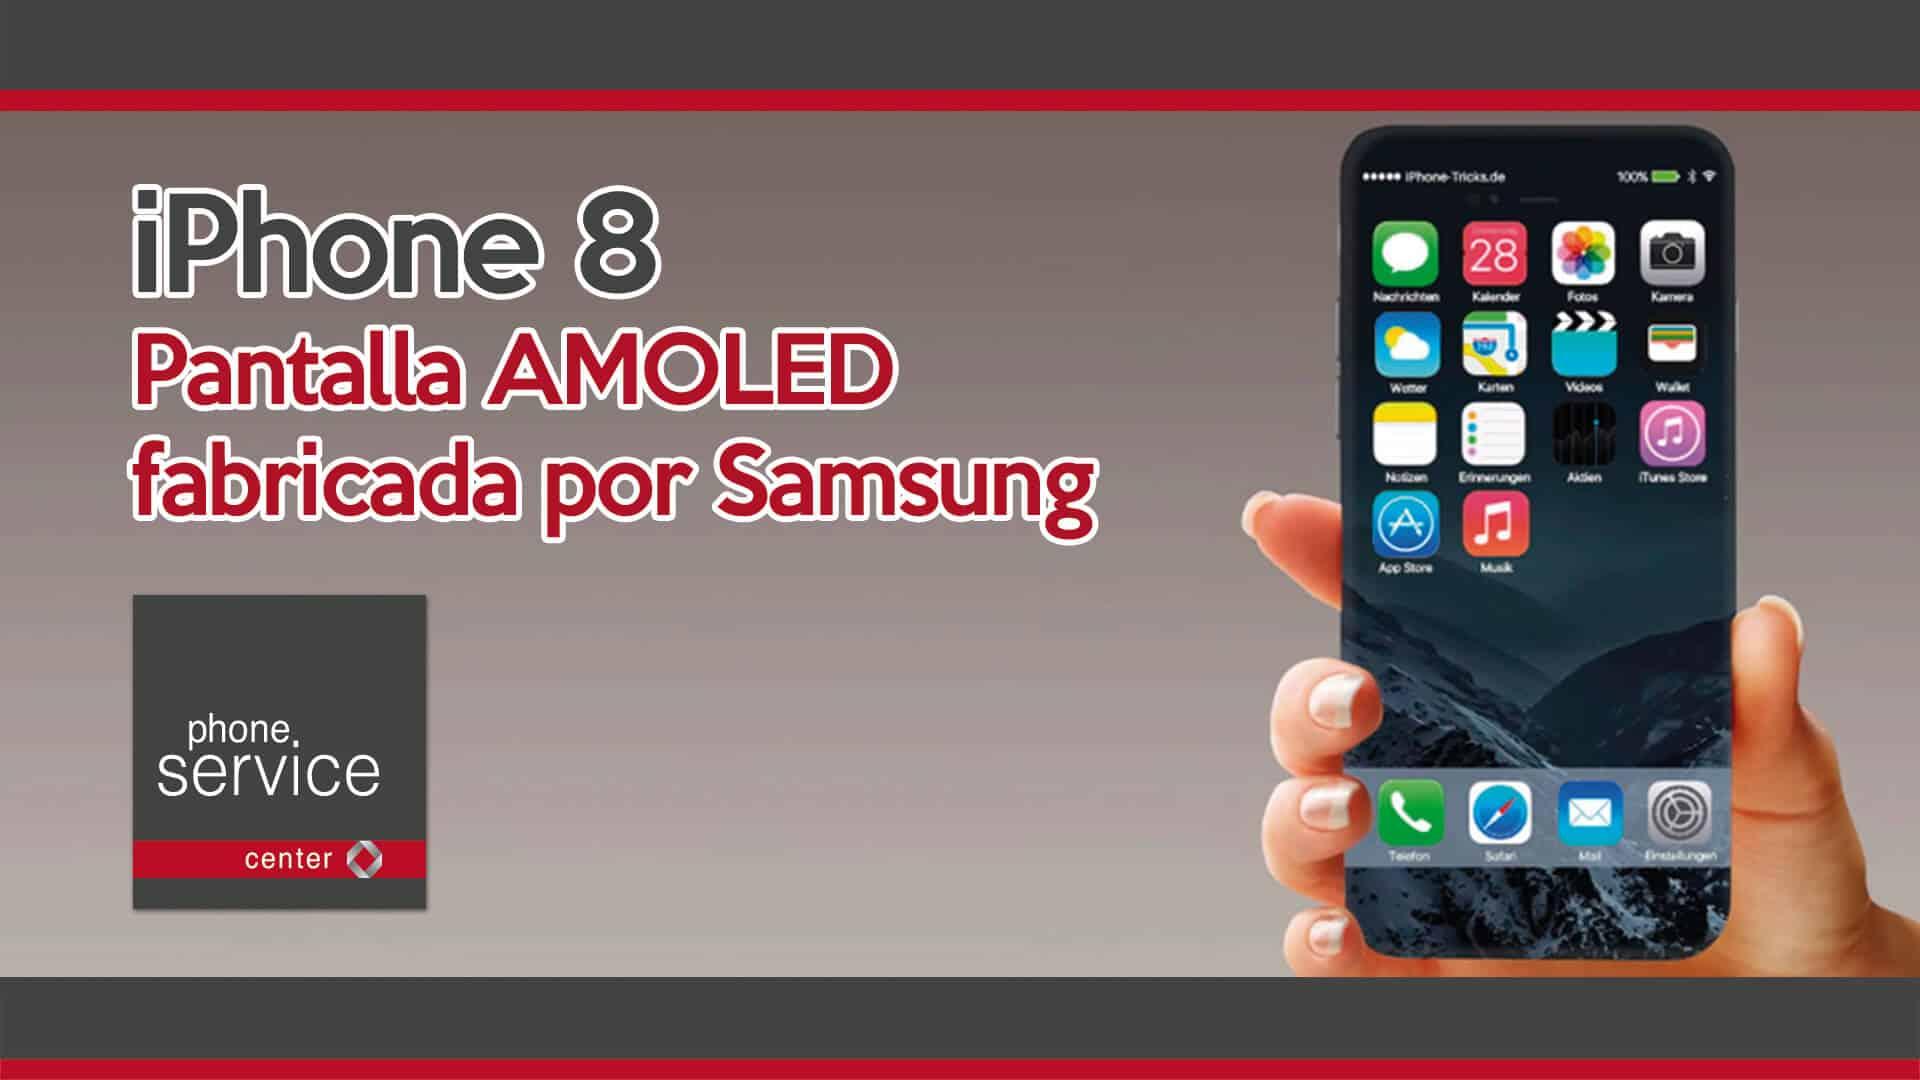 iphone-8-amoled-fabricado-por-samsung